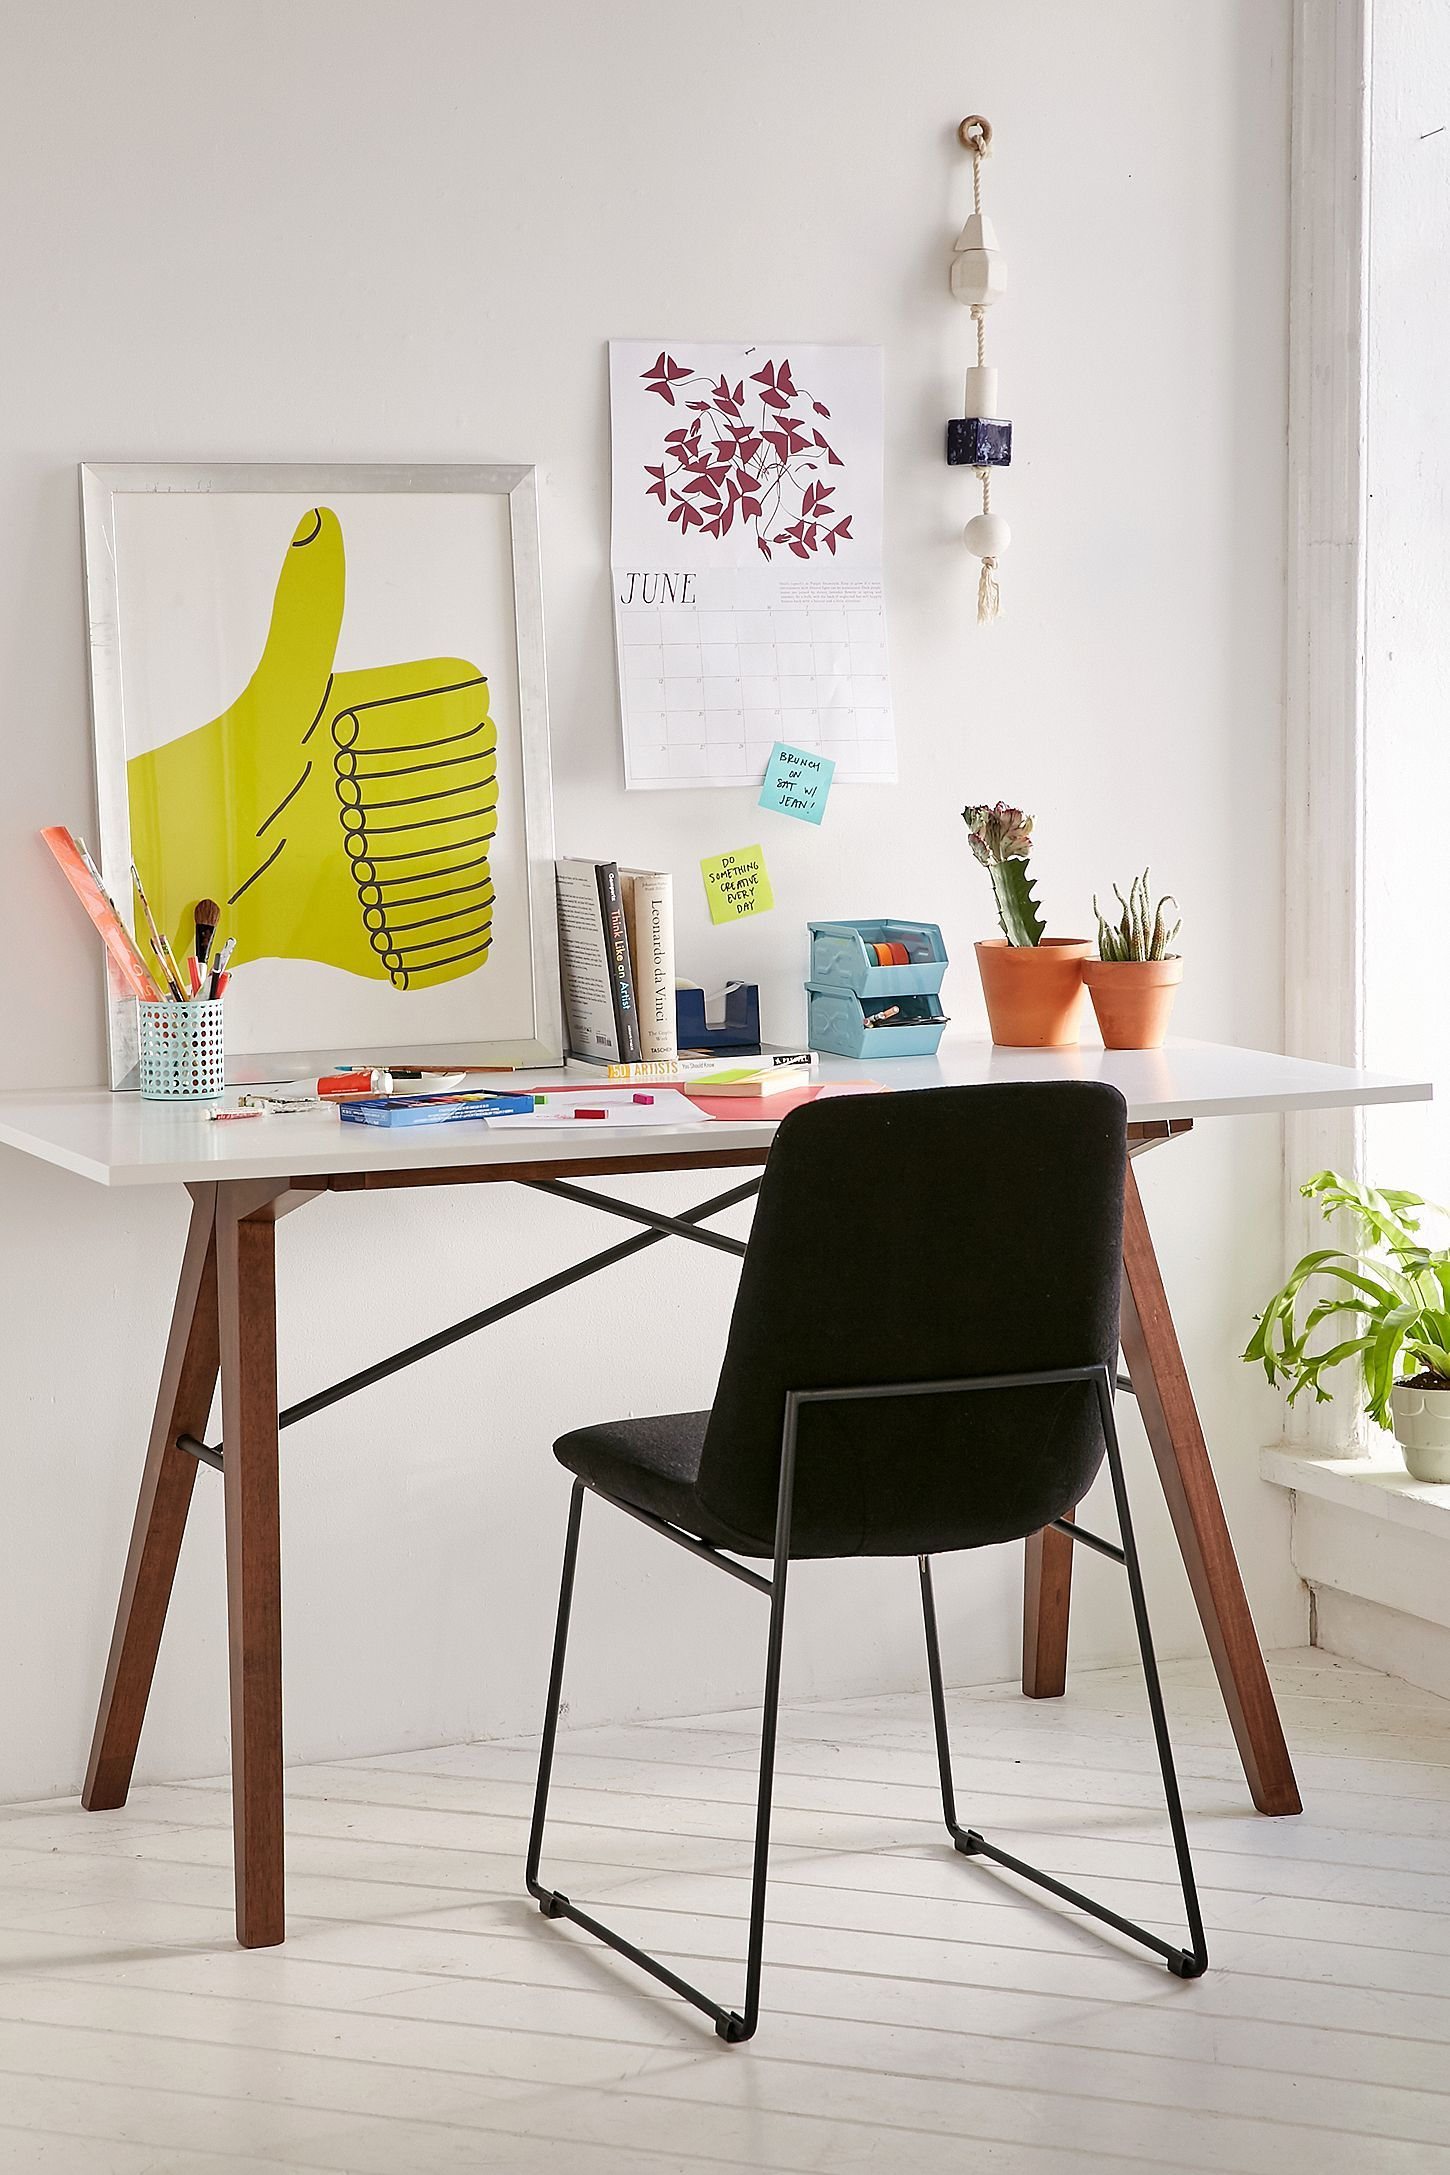 Saints Desk | Urban outfitters furniture, Rustic desk ...